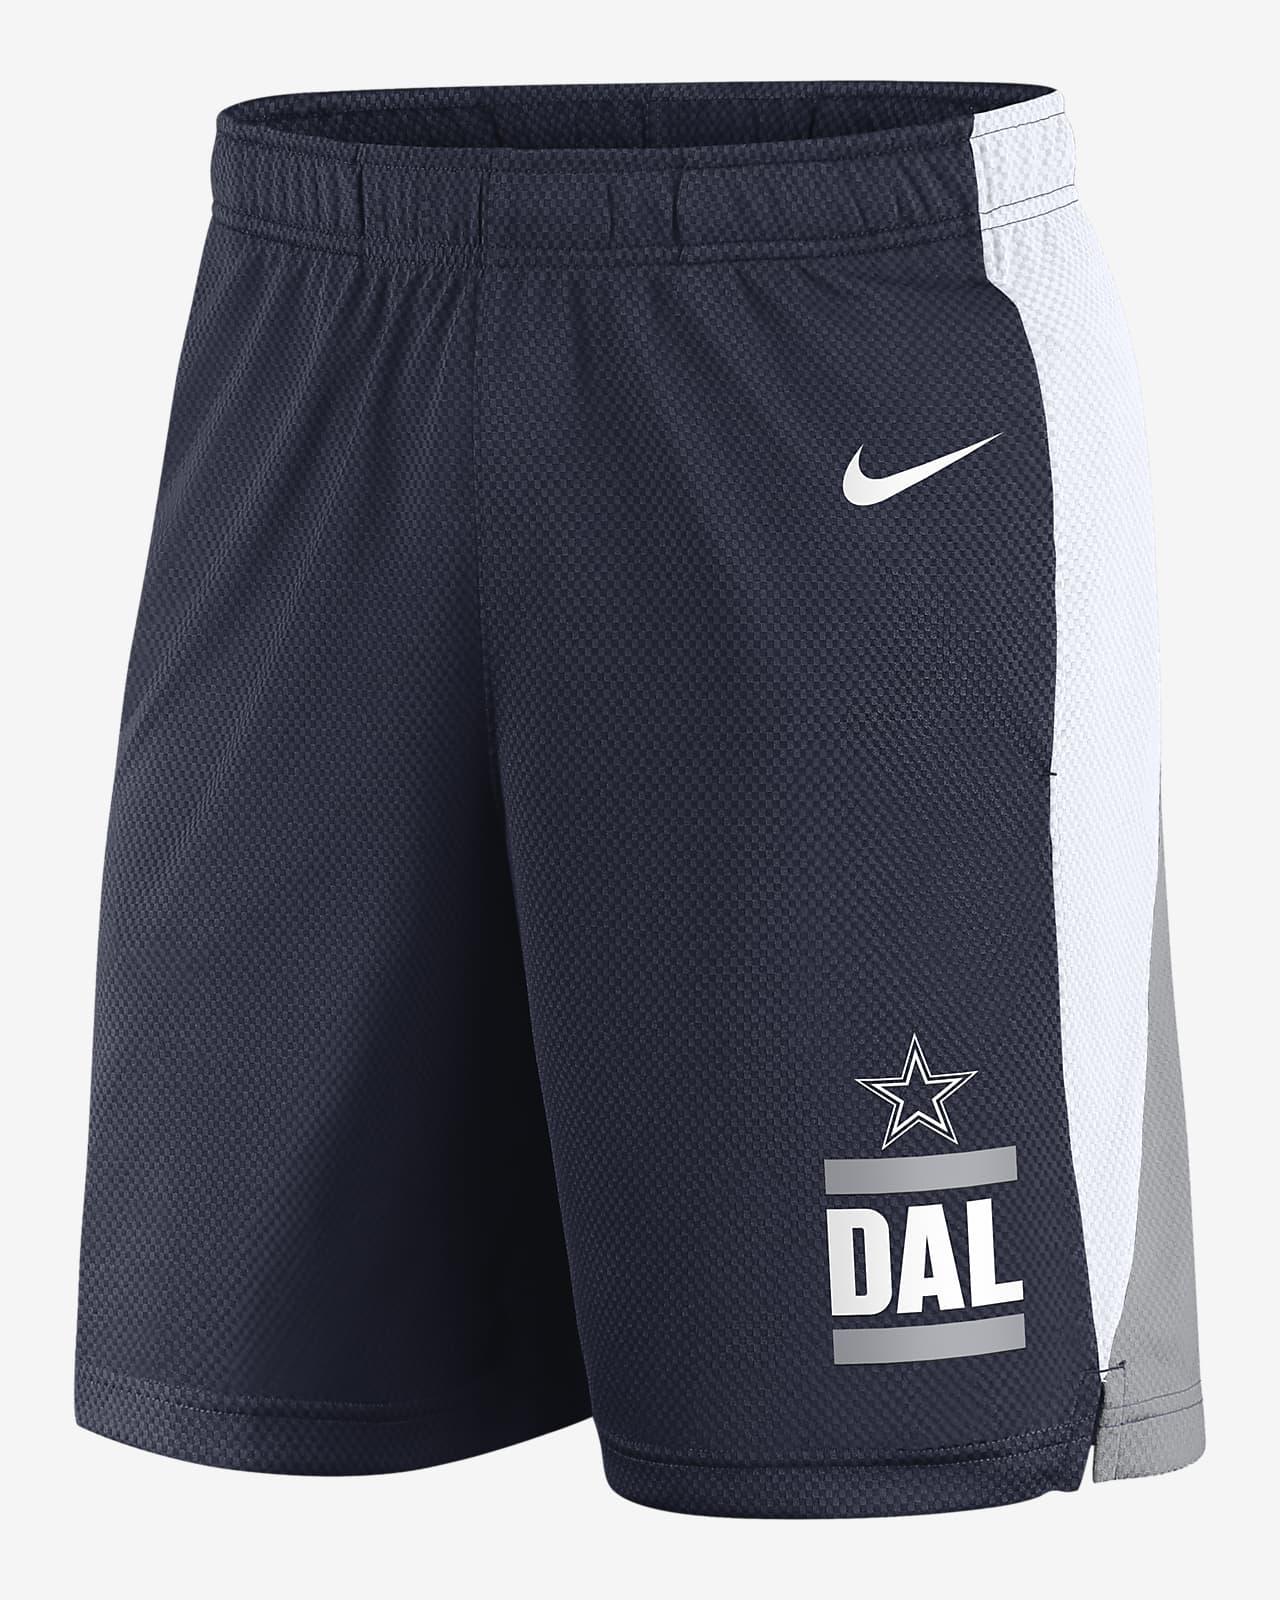 Nike Dri-FIT Broadcast (NFL Dallas Cowboys) Men's Shorts